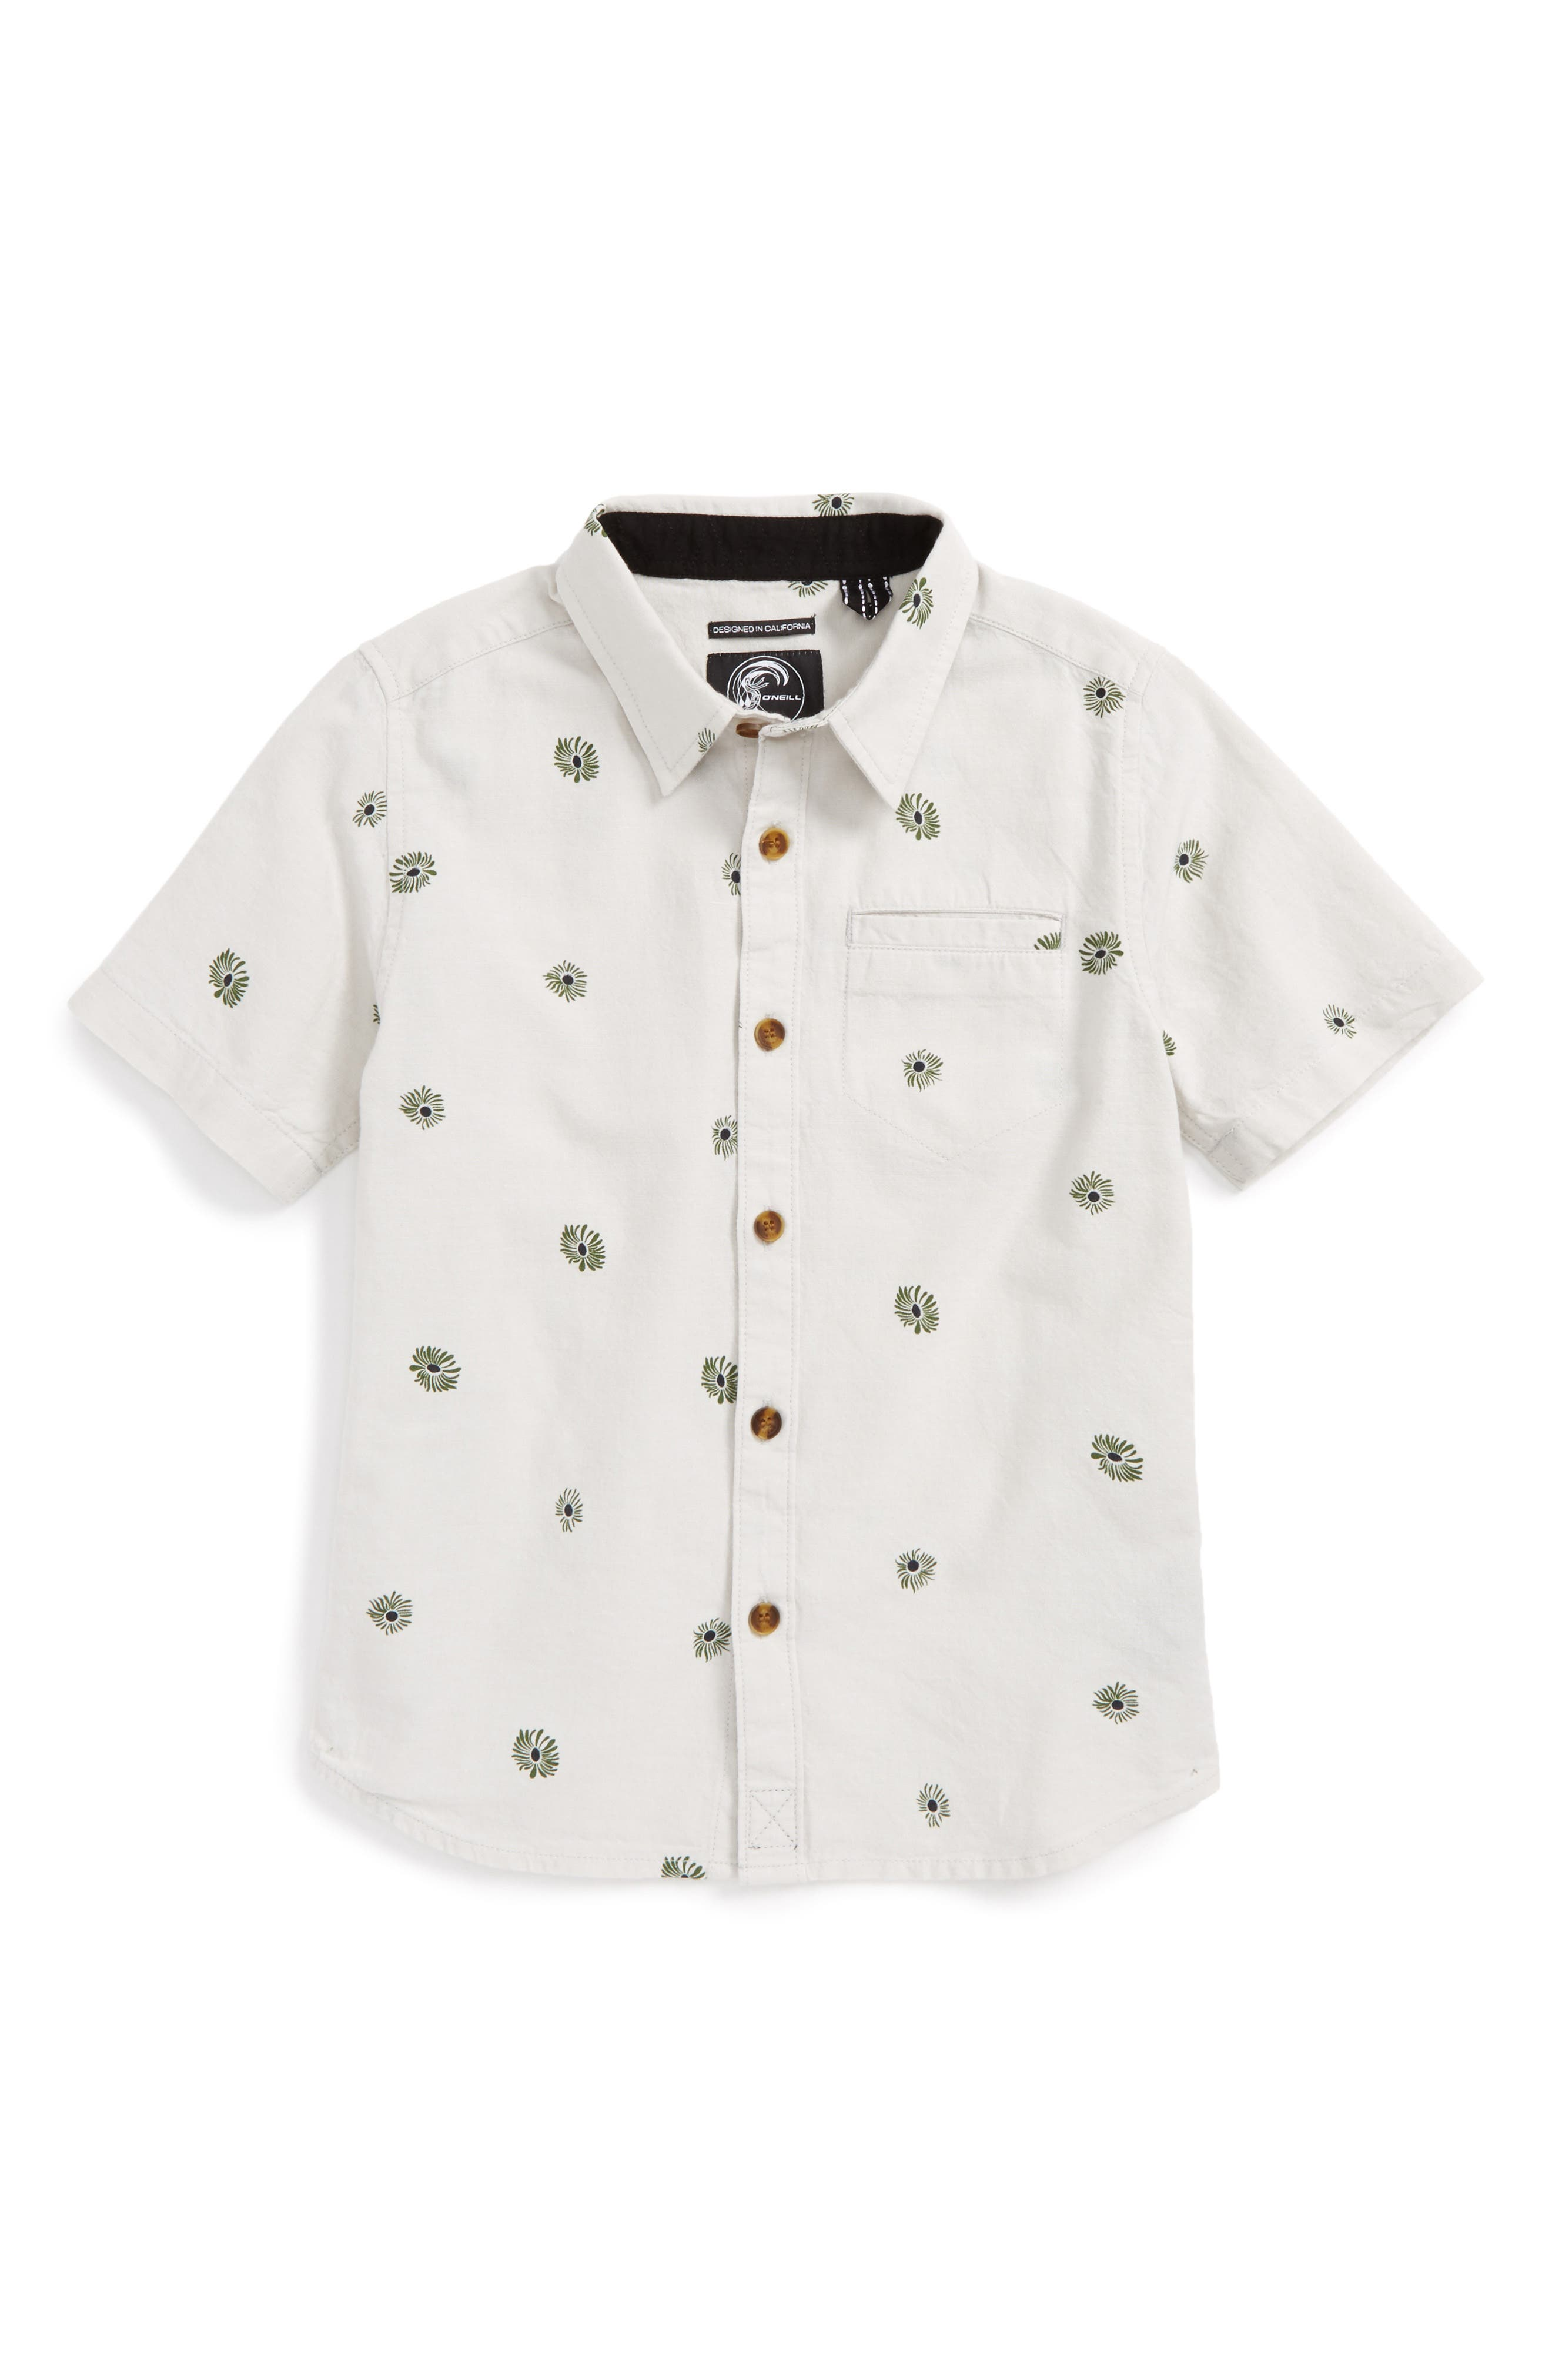 O'Neill Brees Floral Print Woven Shirt (Toddler Boys)